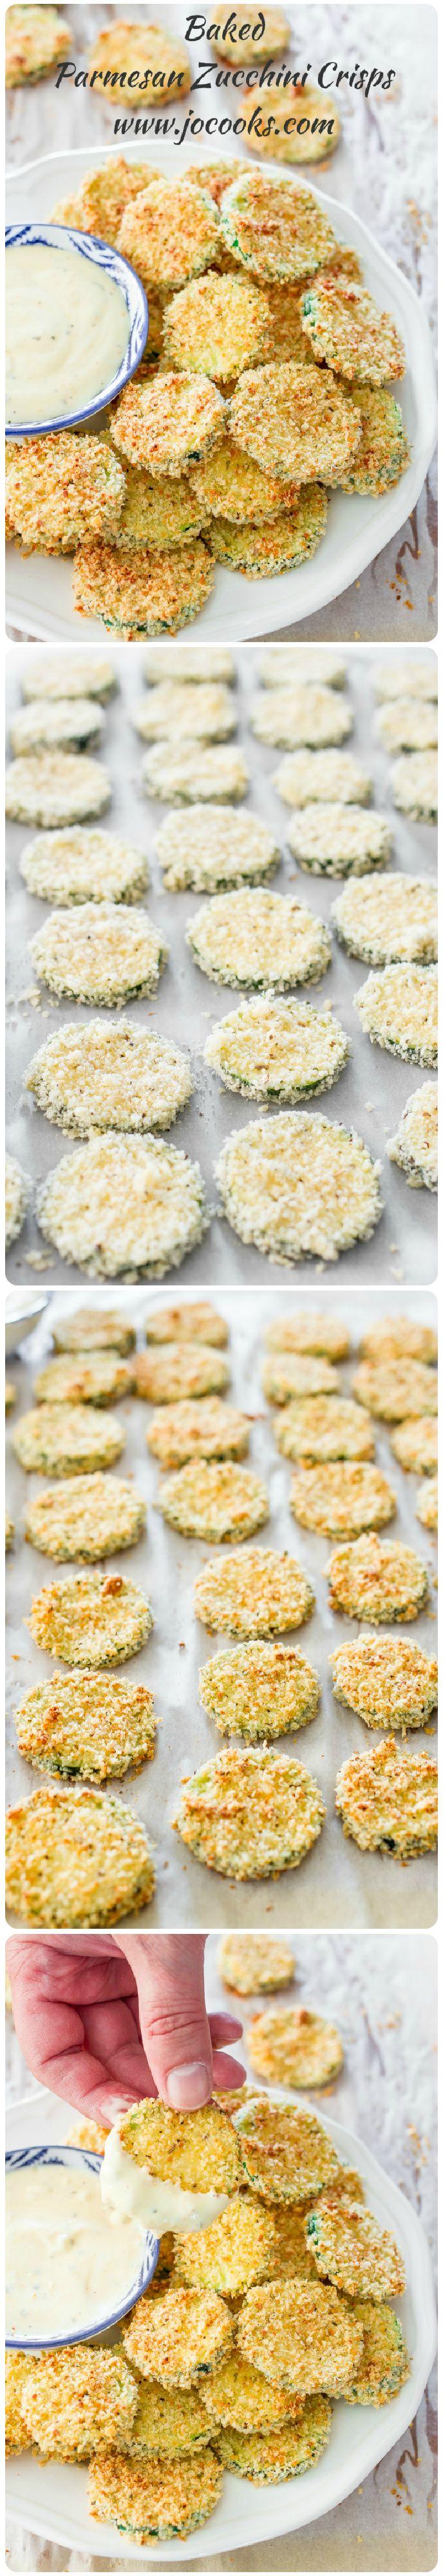 Snack Idea: Baked Parmesan Zucchini crisps